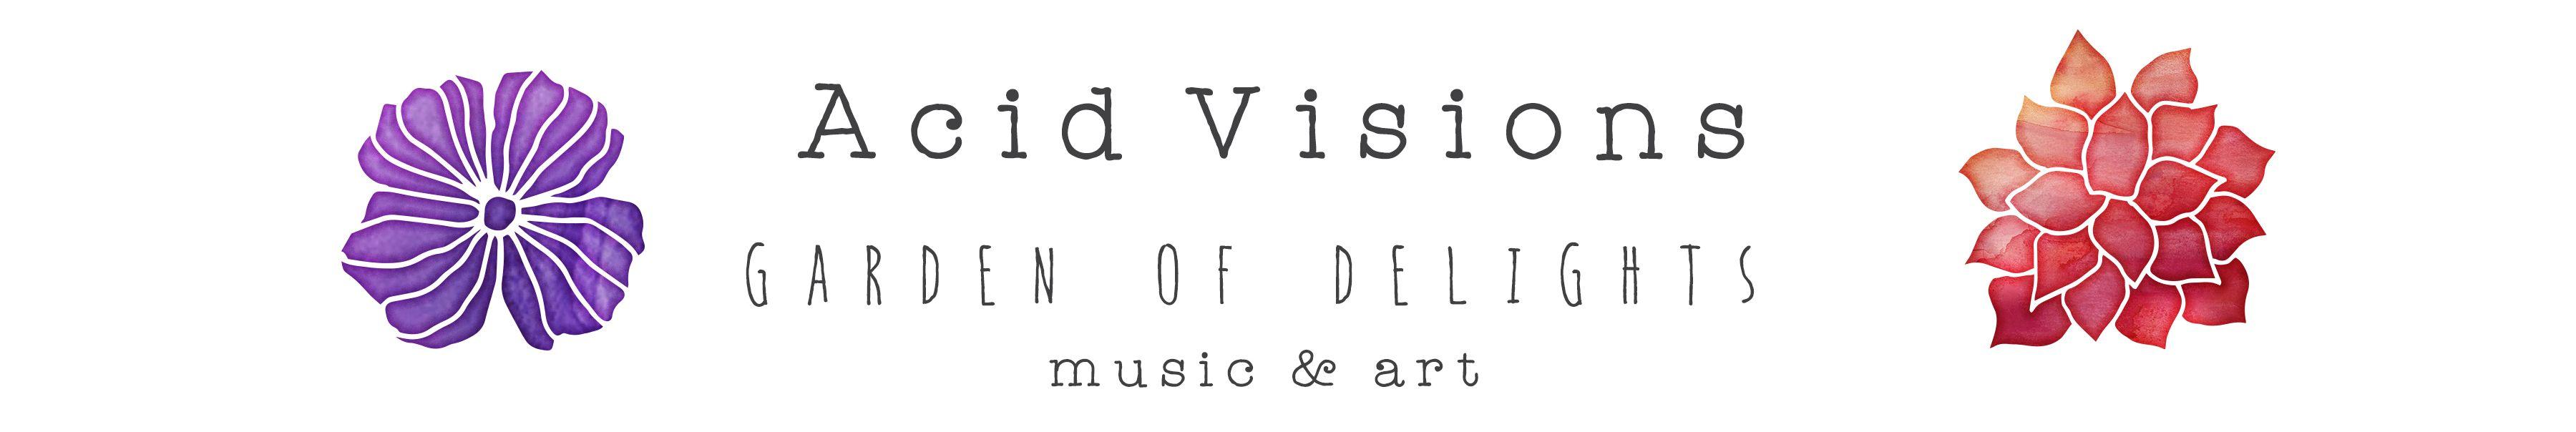 Acid Visions